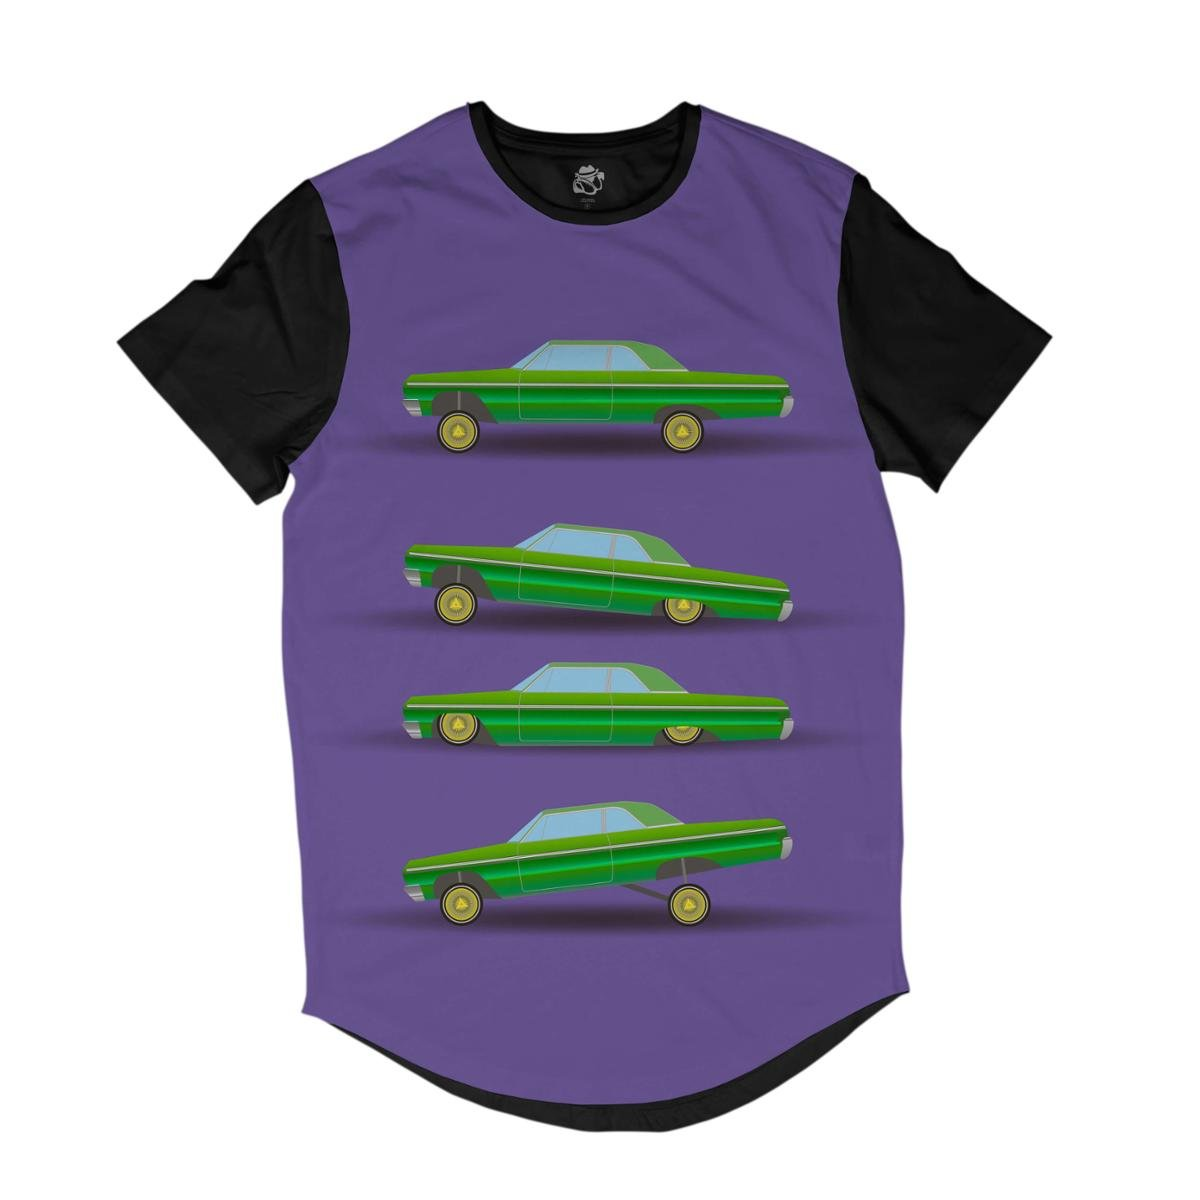 Camiseta Bsc Longline Desenho 4 Carros Lowriders Sublimada